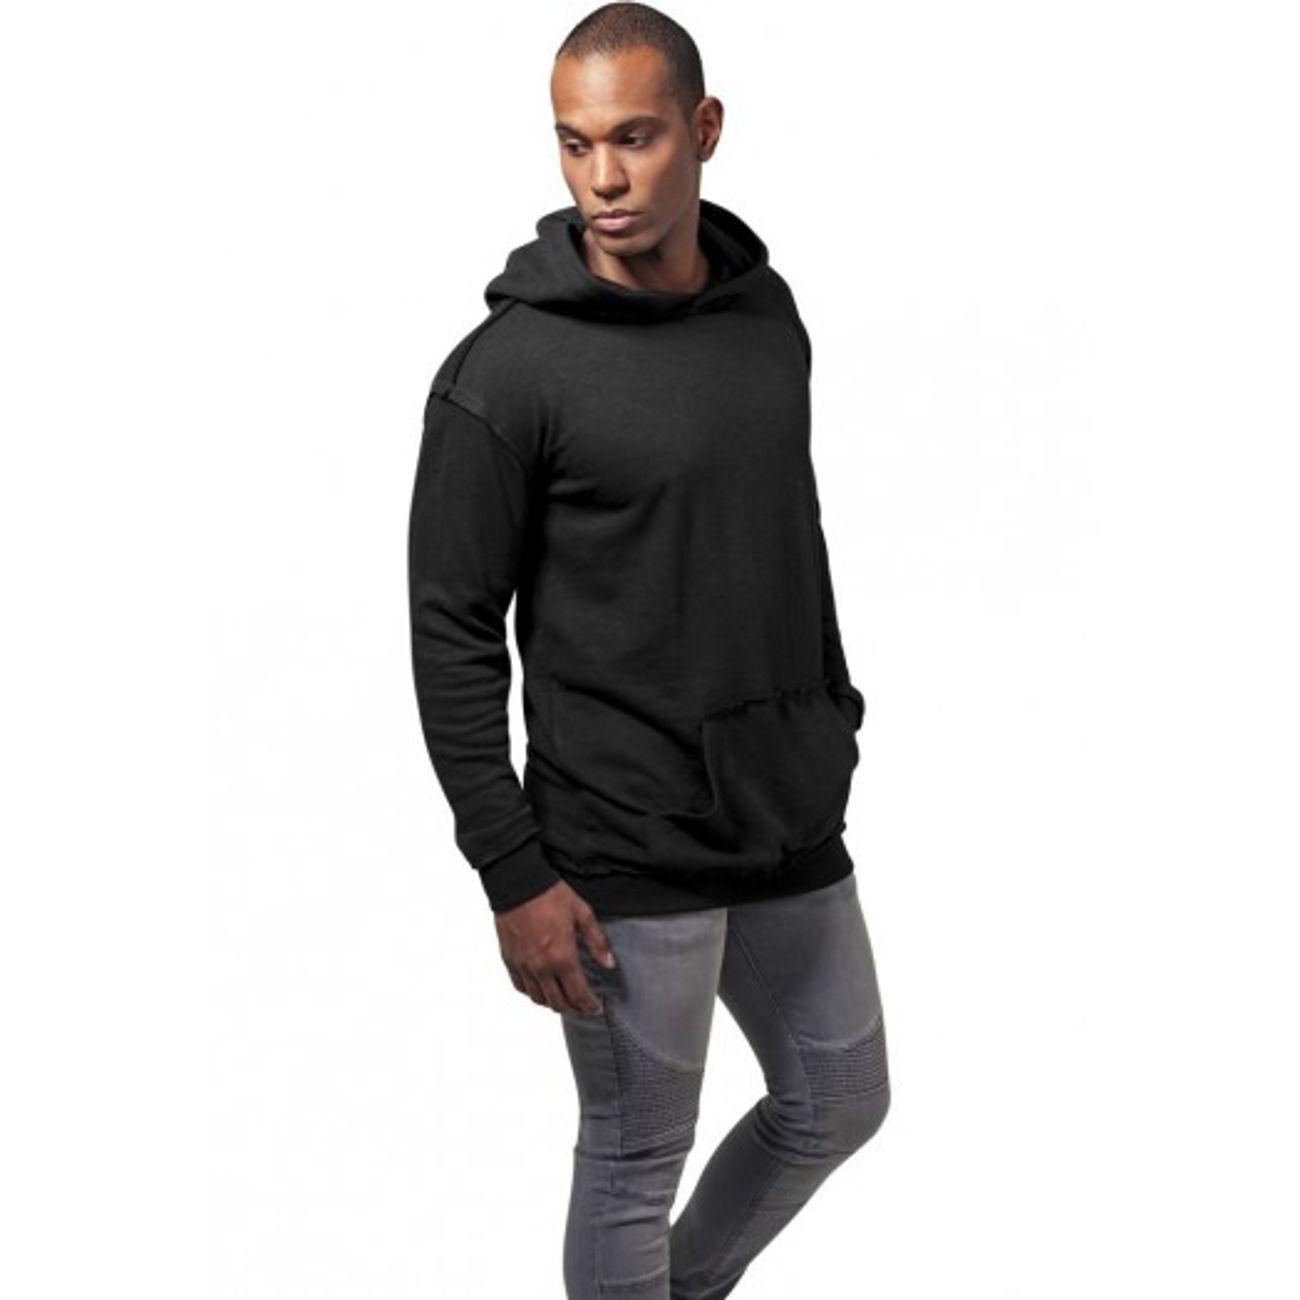 Mode Lifestyle adulte URBAN CLASSICS Sweat Capuche Oversize Urban Classics Noir Coutures Visibles